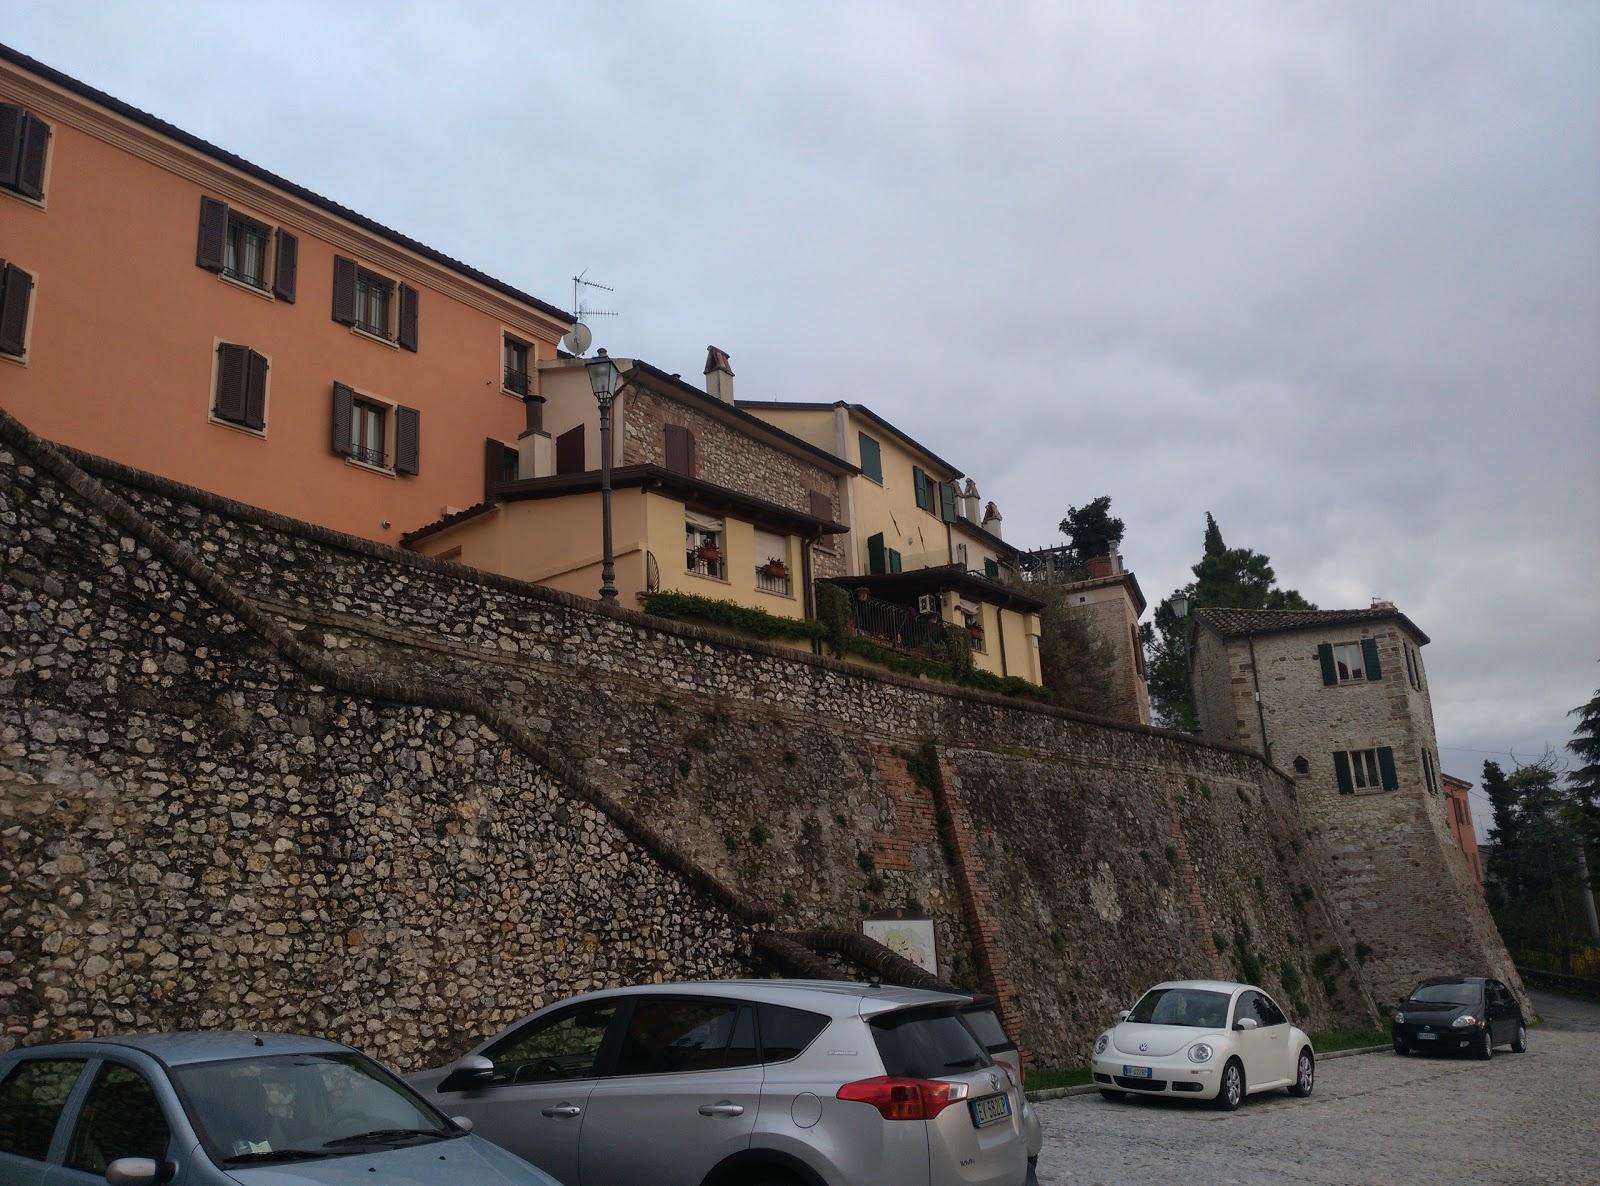 Villa Verucchio